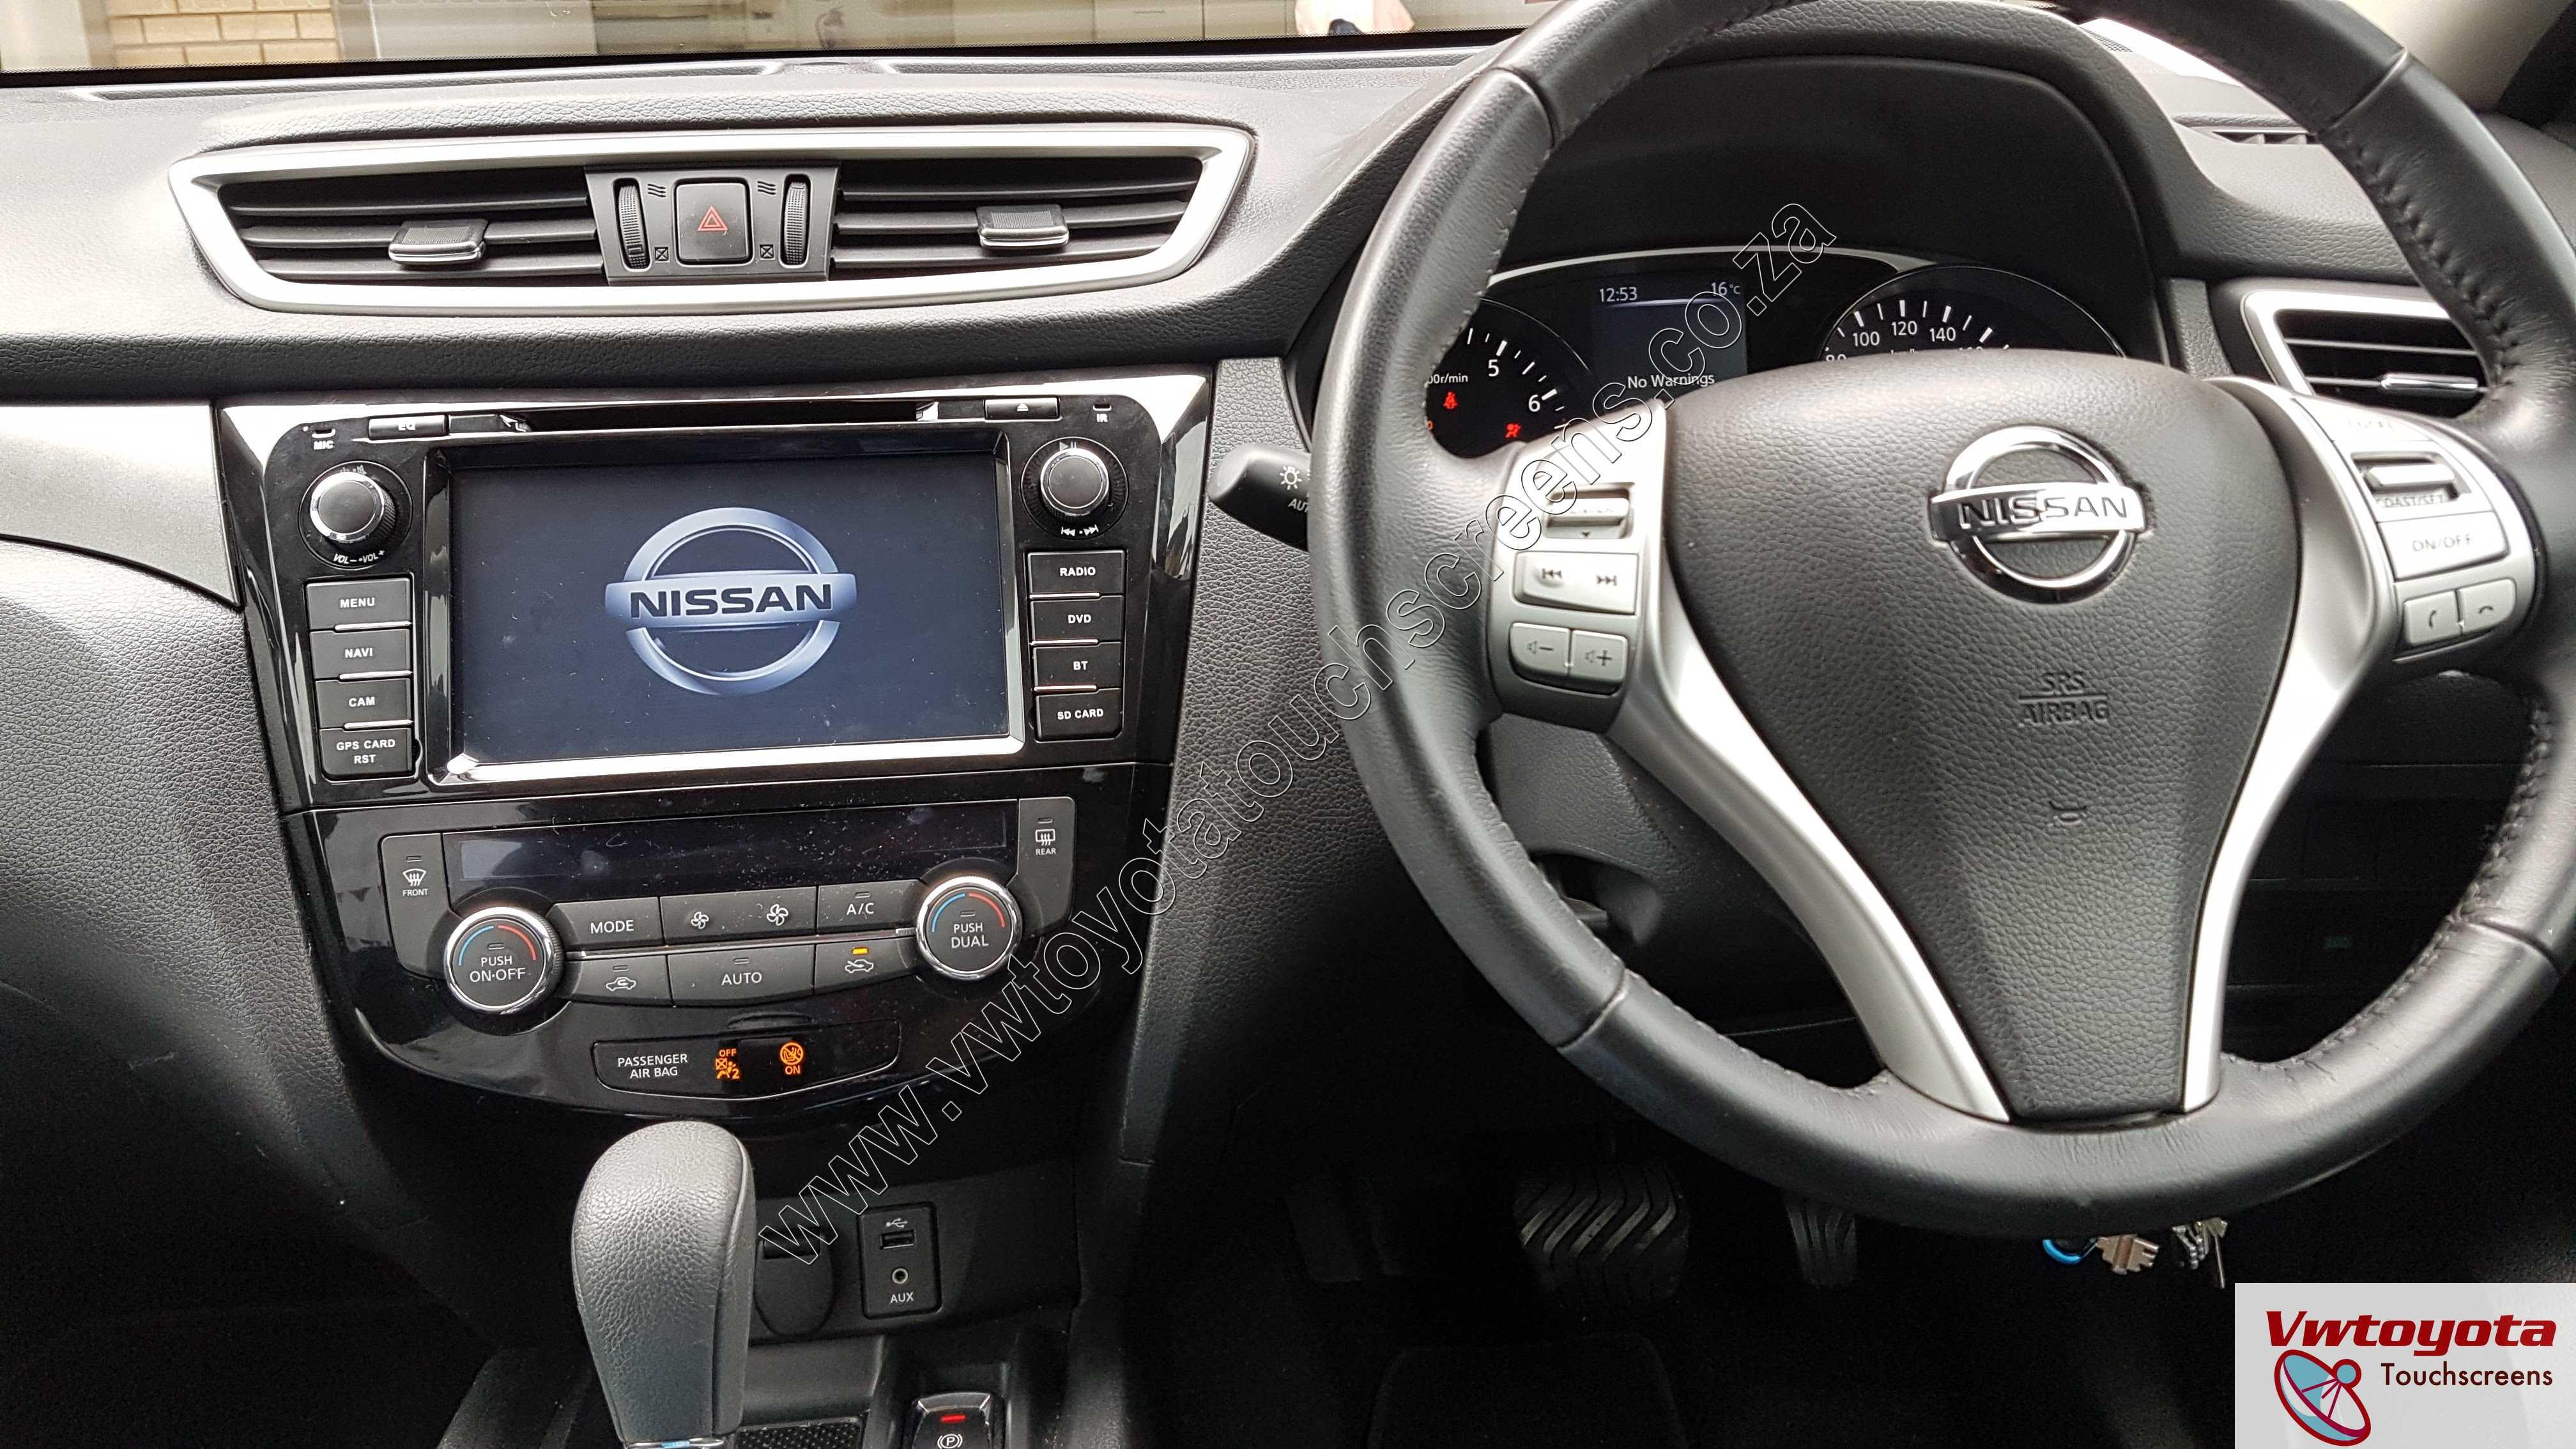 Nissan X-Trail / Qashqai (2014-2018) GPS DVD GPS touch ...